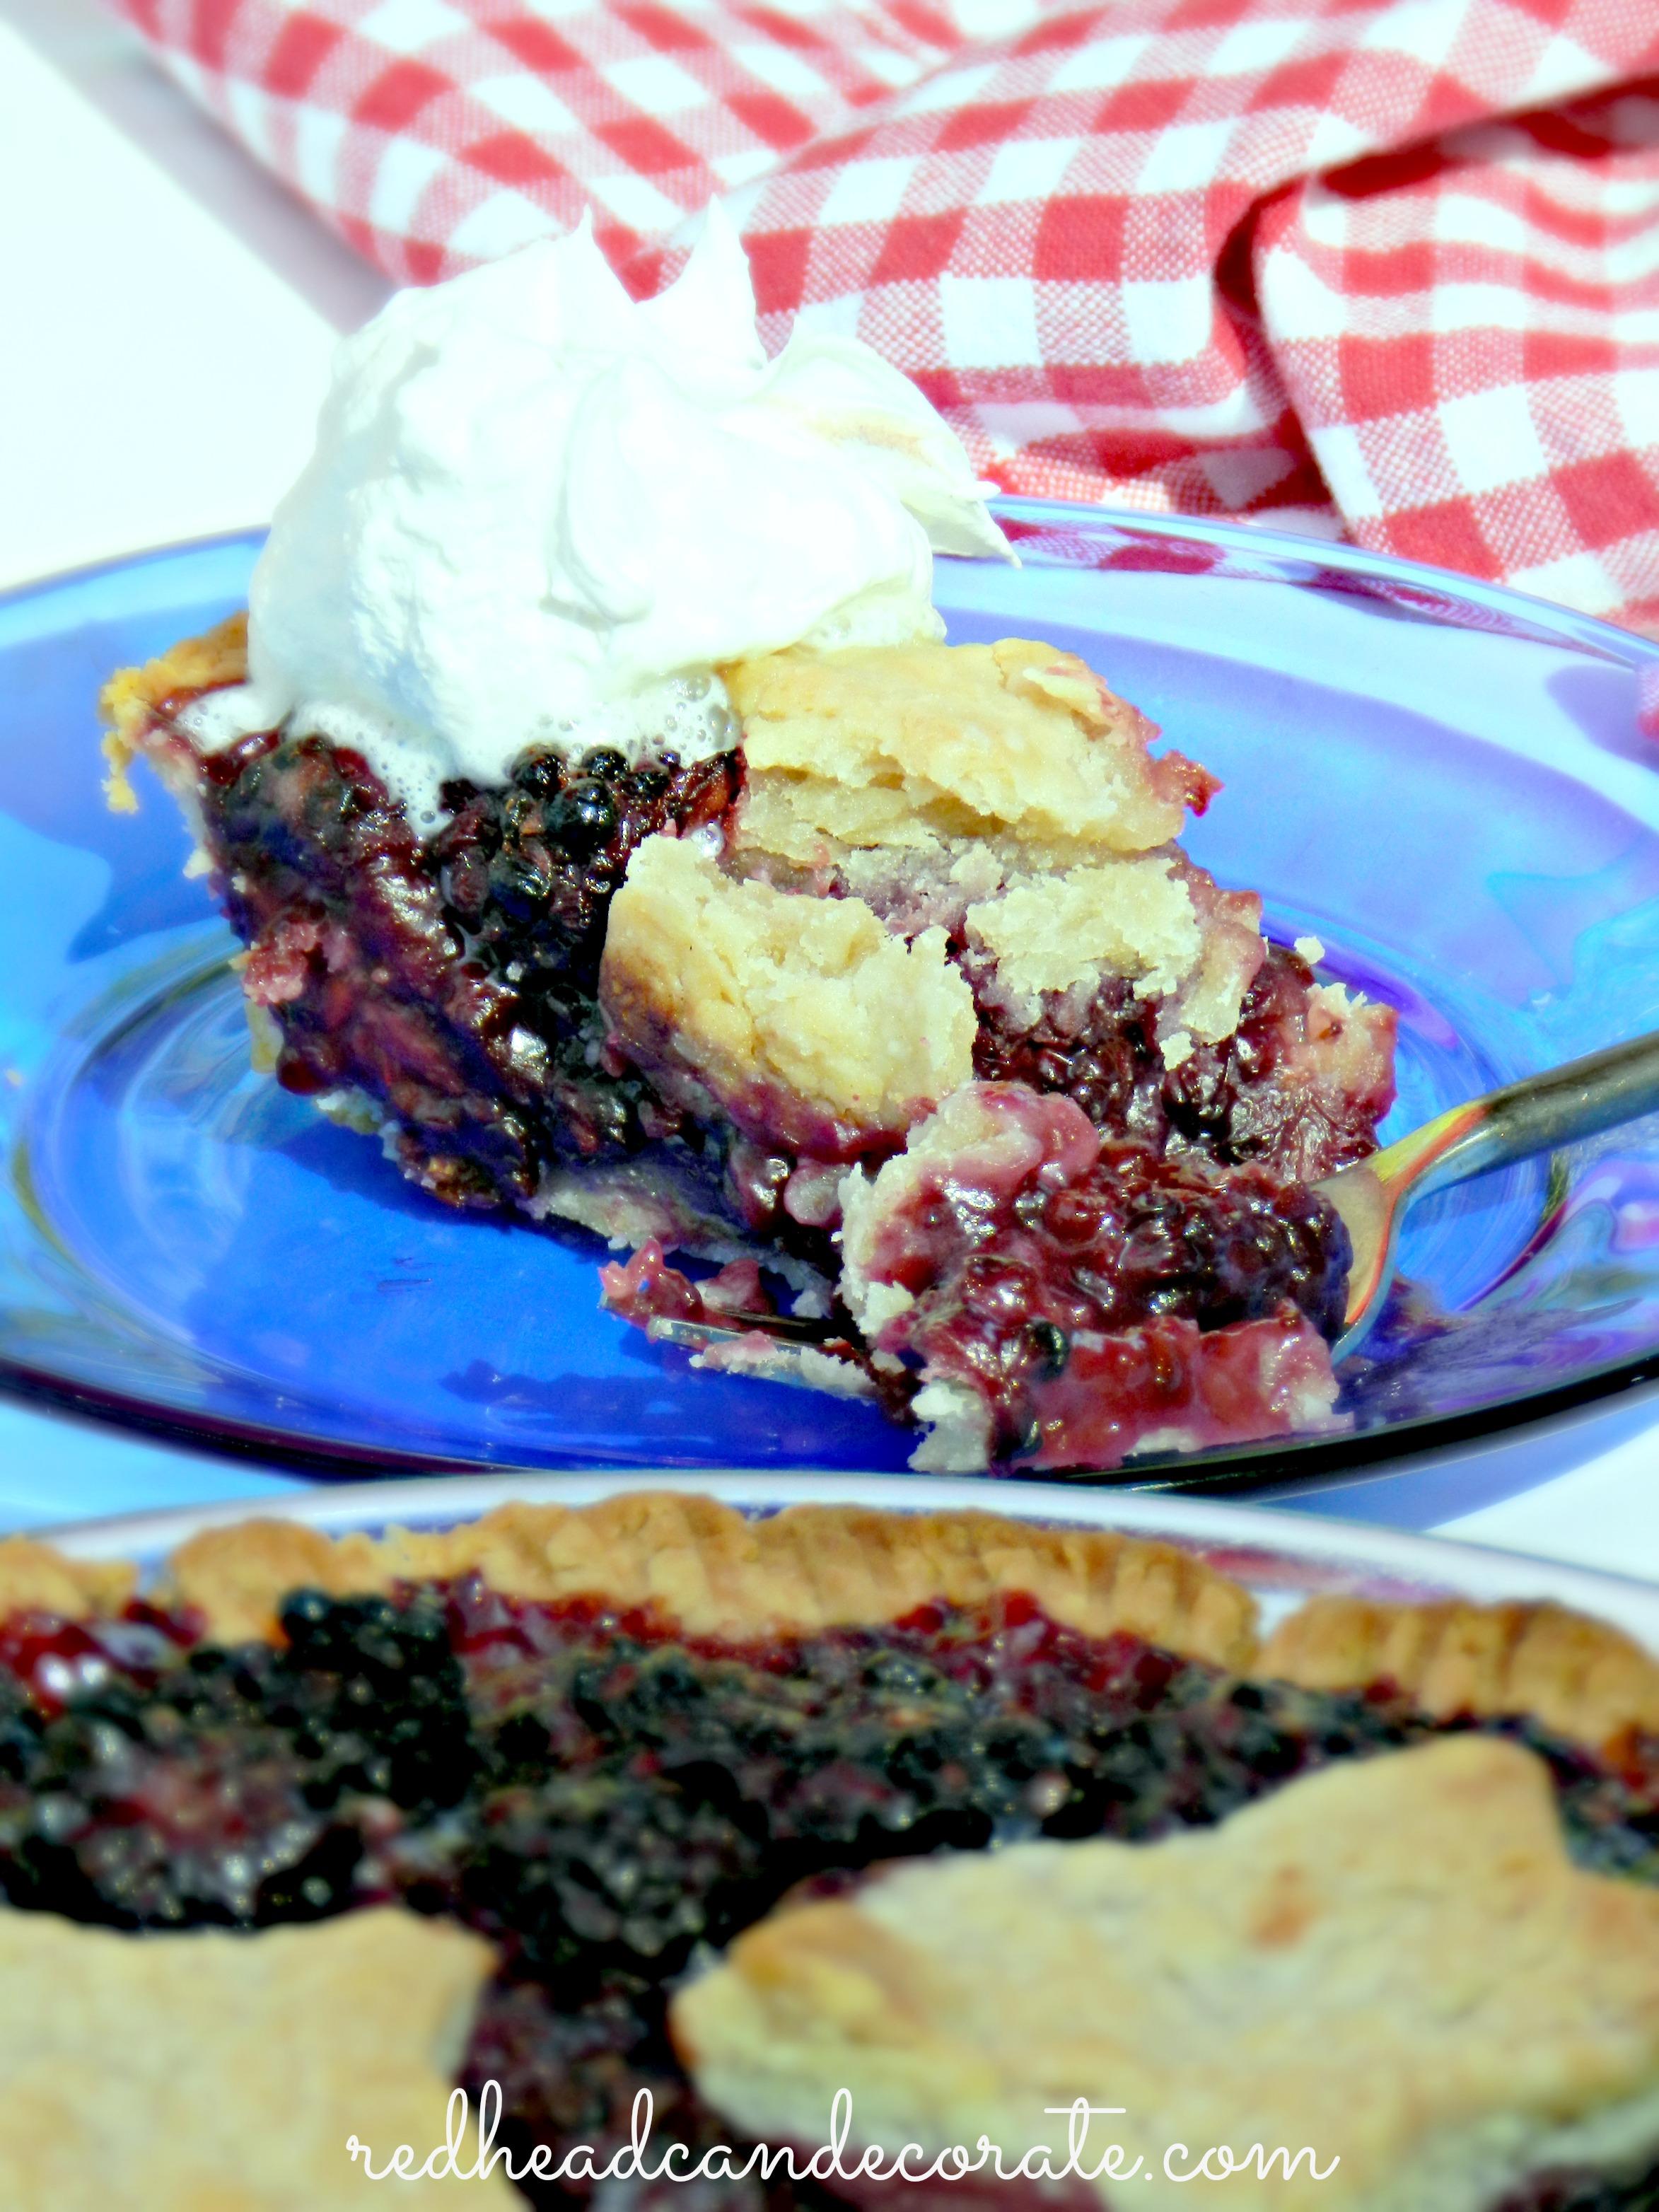 Fast Black Berry Pie!